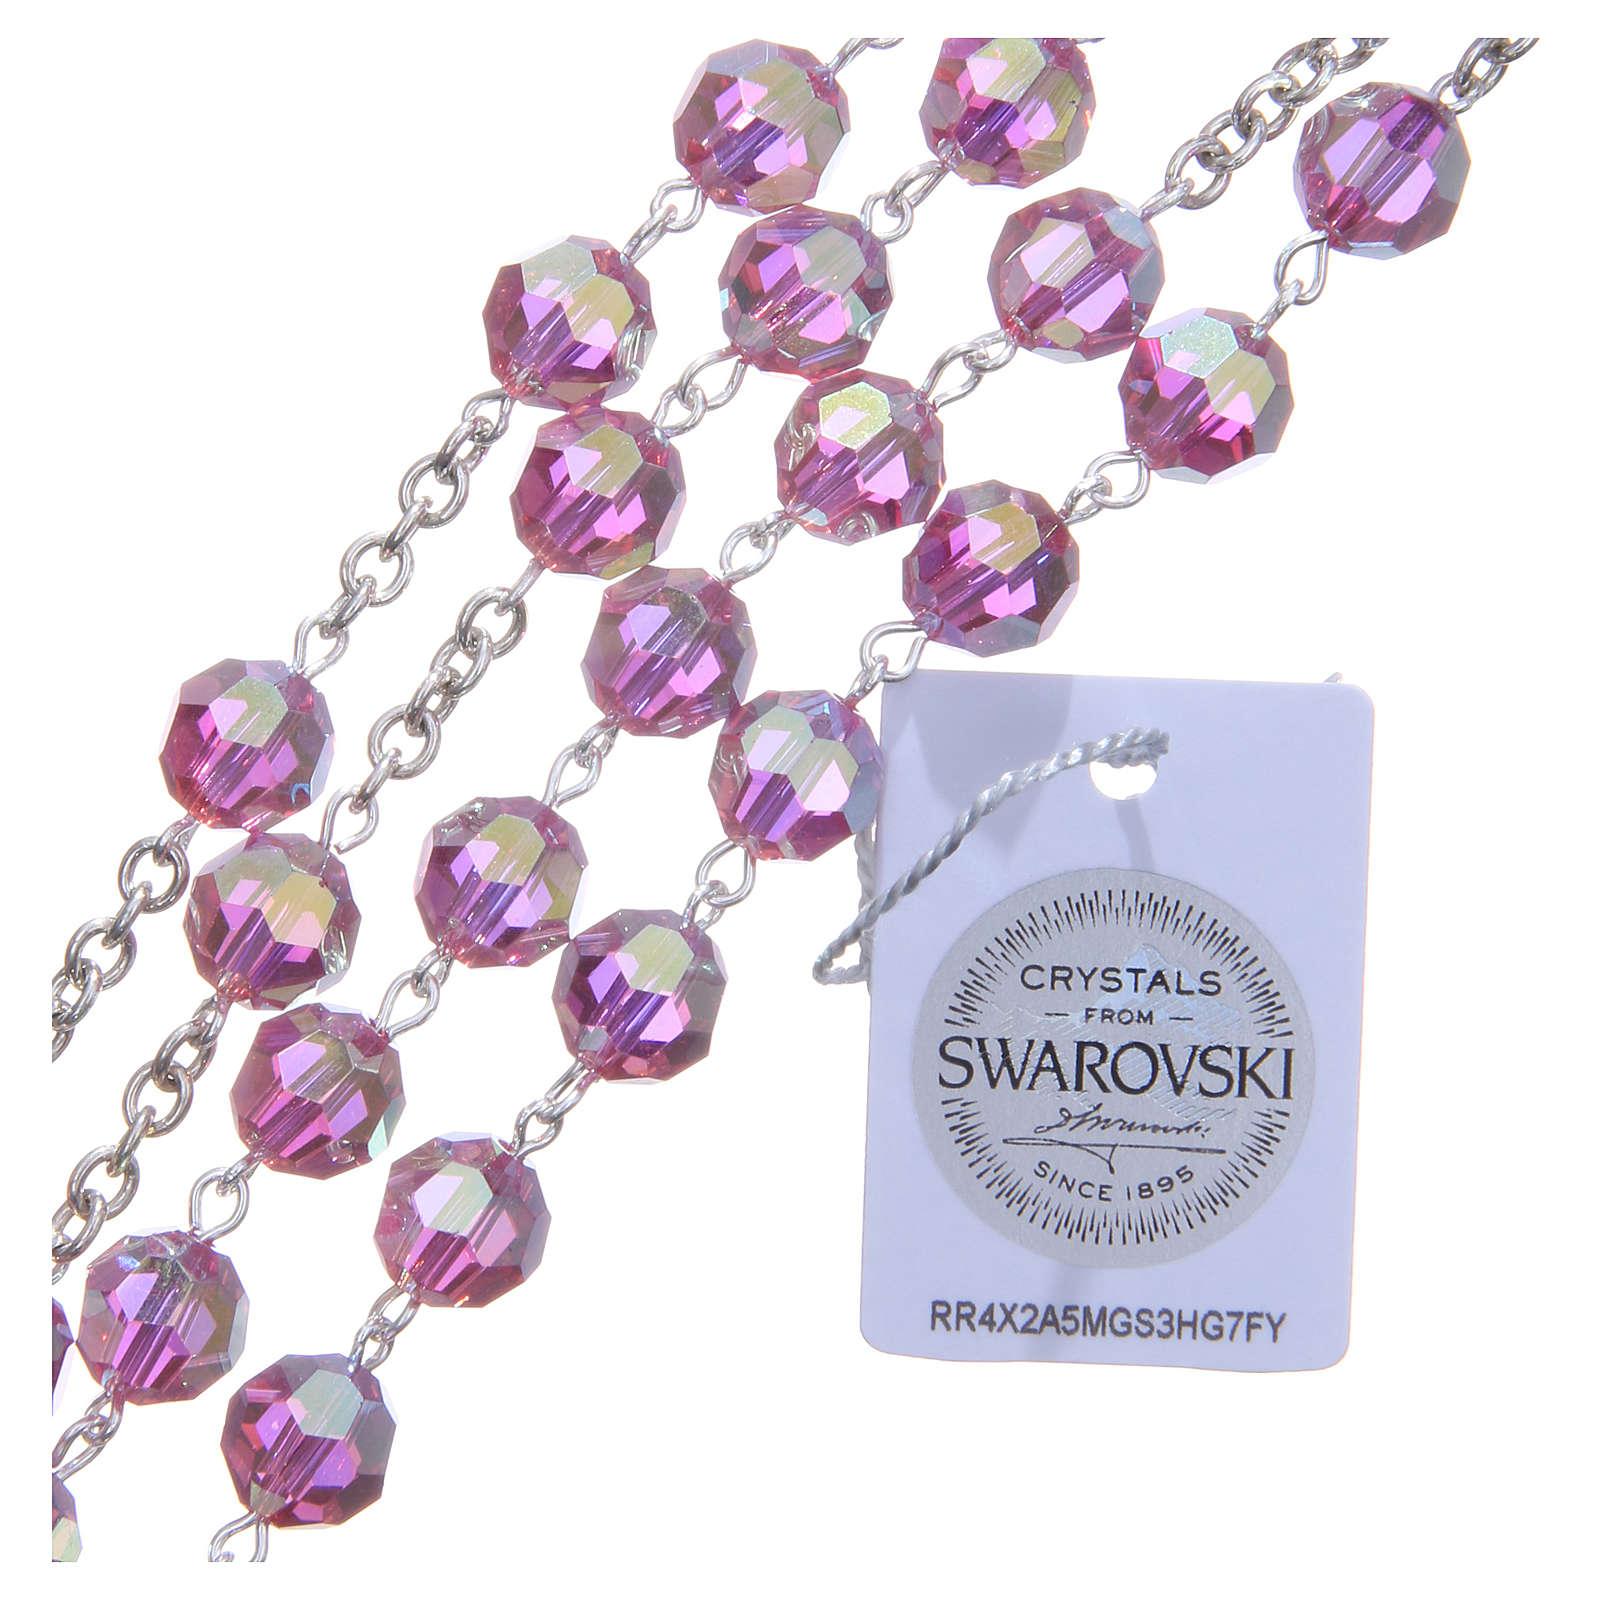 Terço prata 800 cristal Swarovski cor-de-rosa 8 mm 4